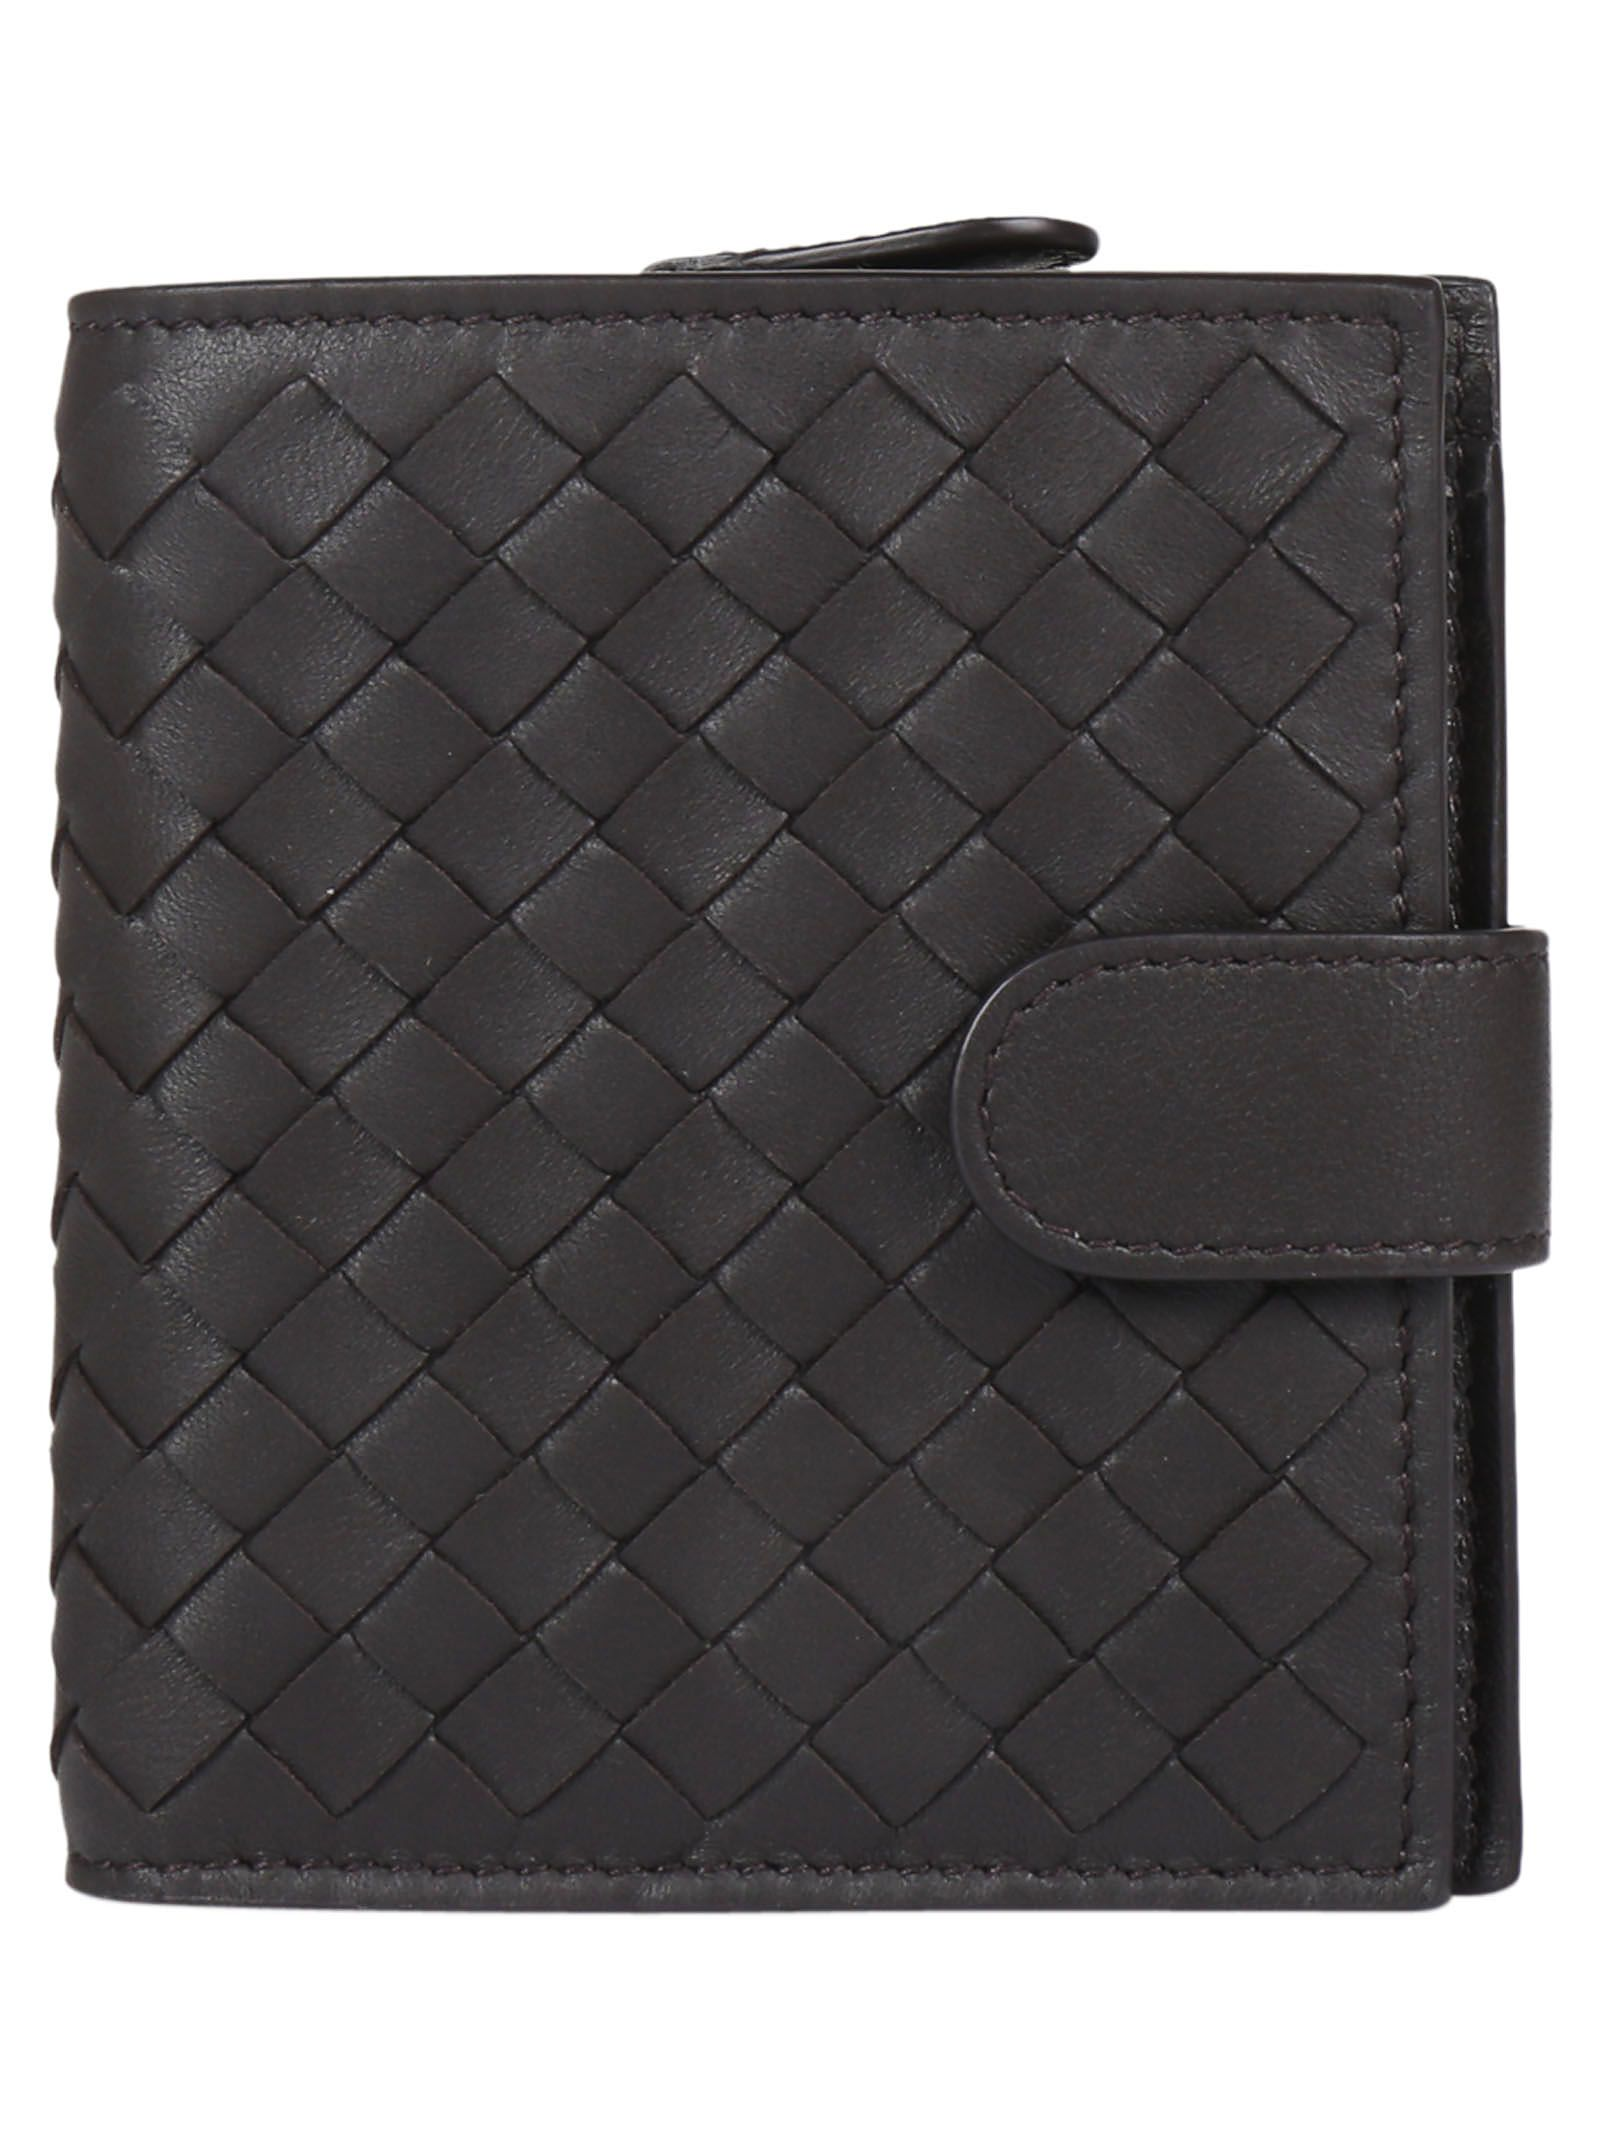 Bottega Veneta Crossbody Wallet